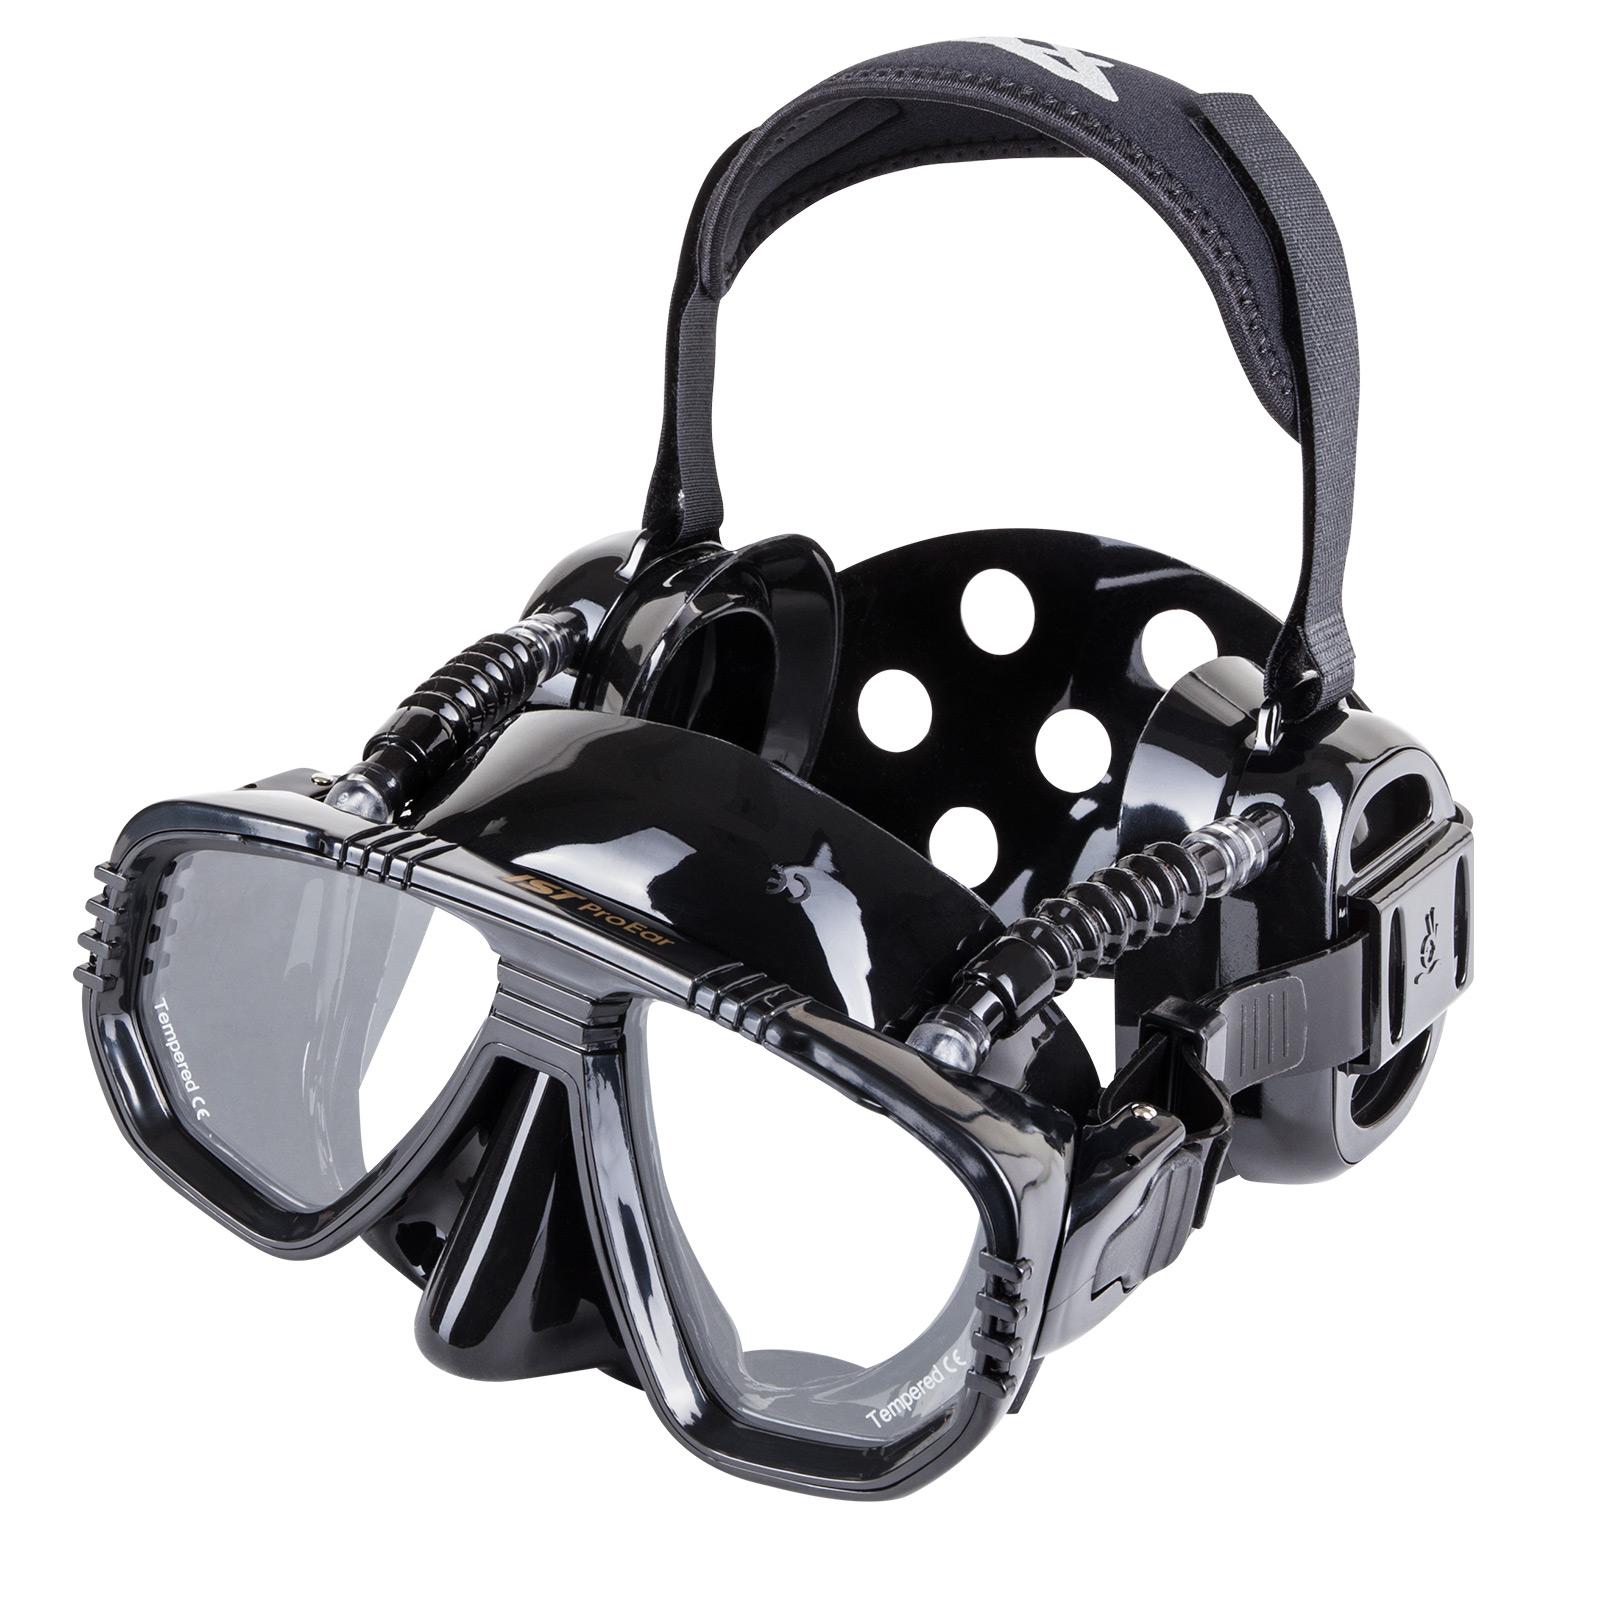 Pro Ear Mask (ANTI-FOG)